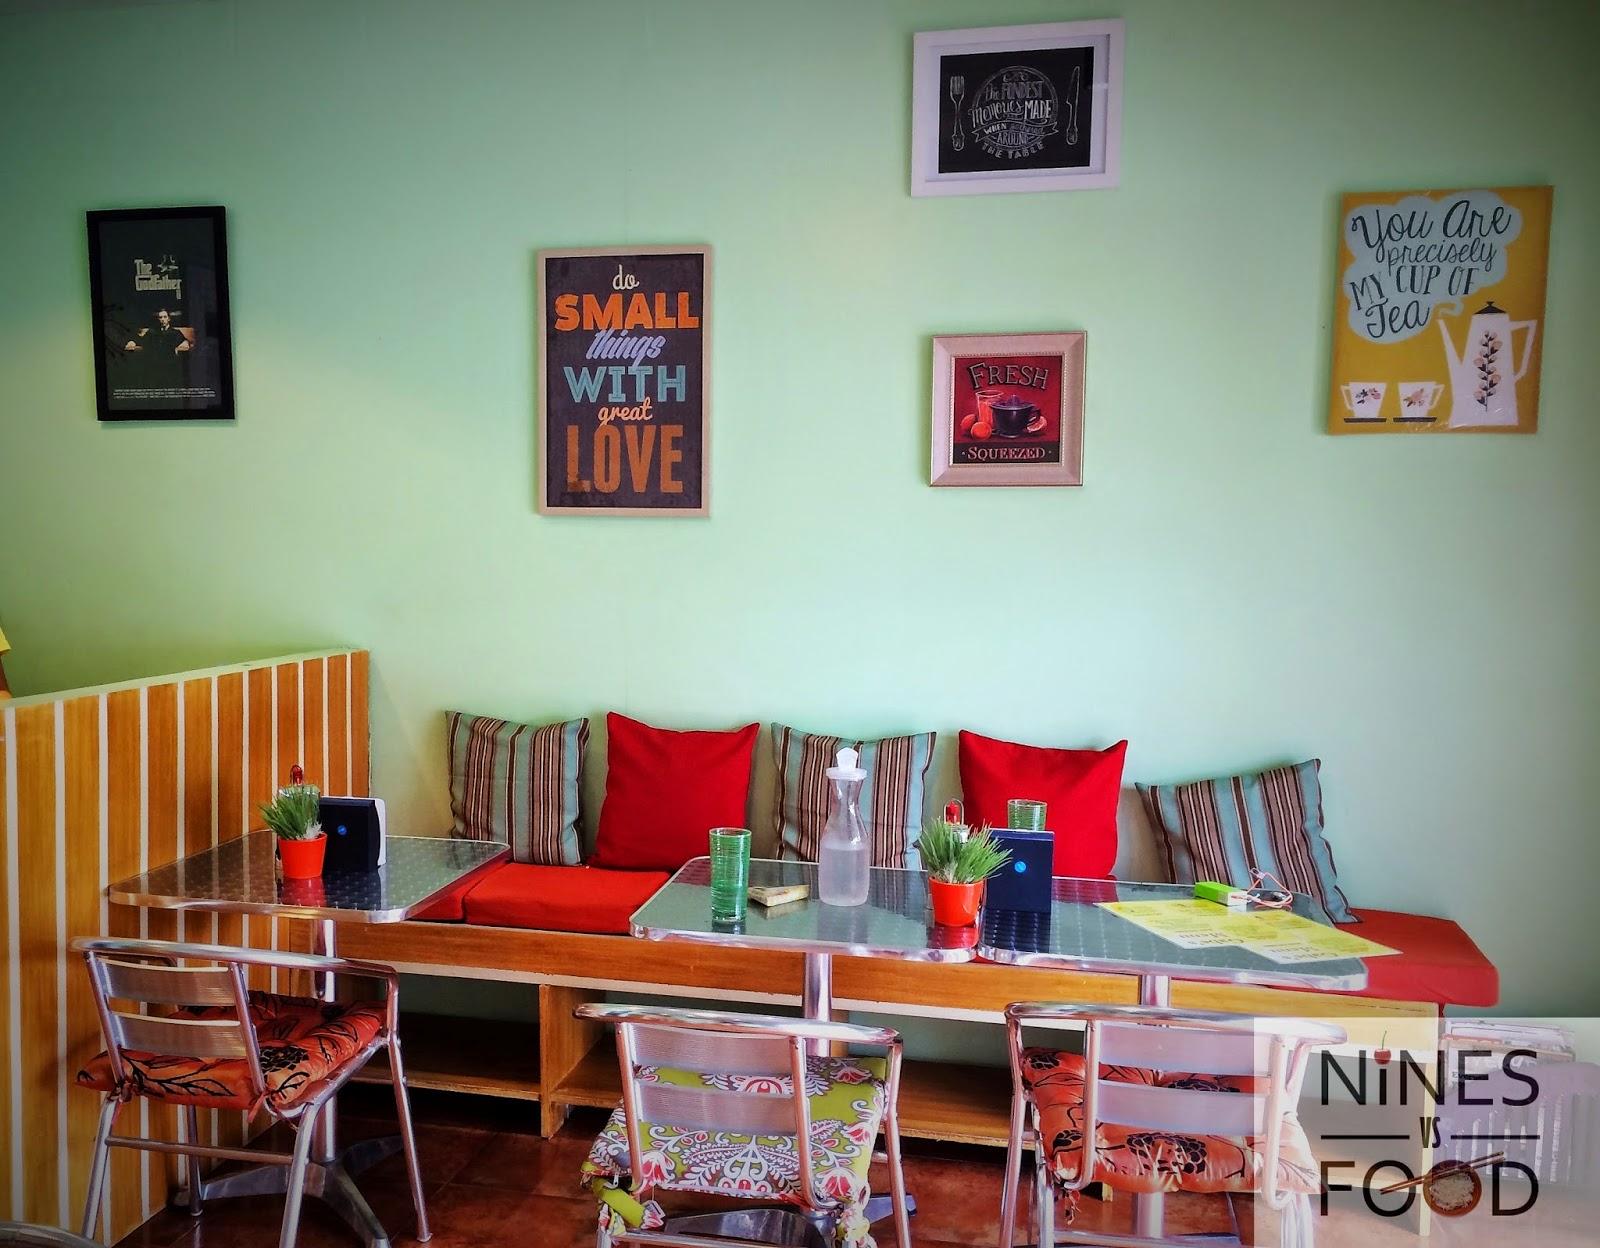 Nines vs. Food - Gabe's Home Kitchen-3.jpg